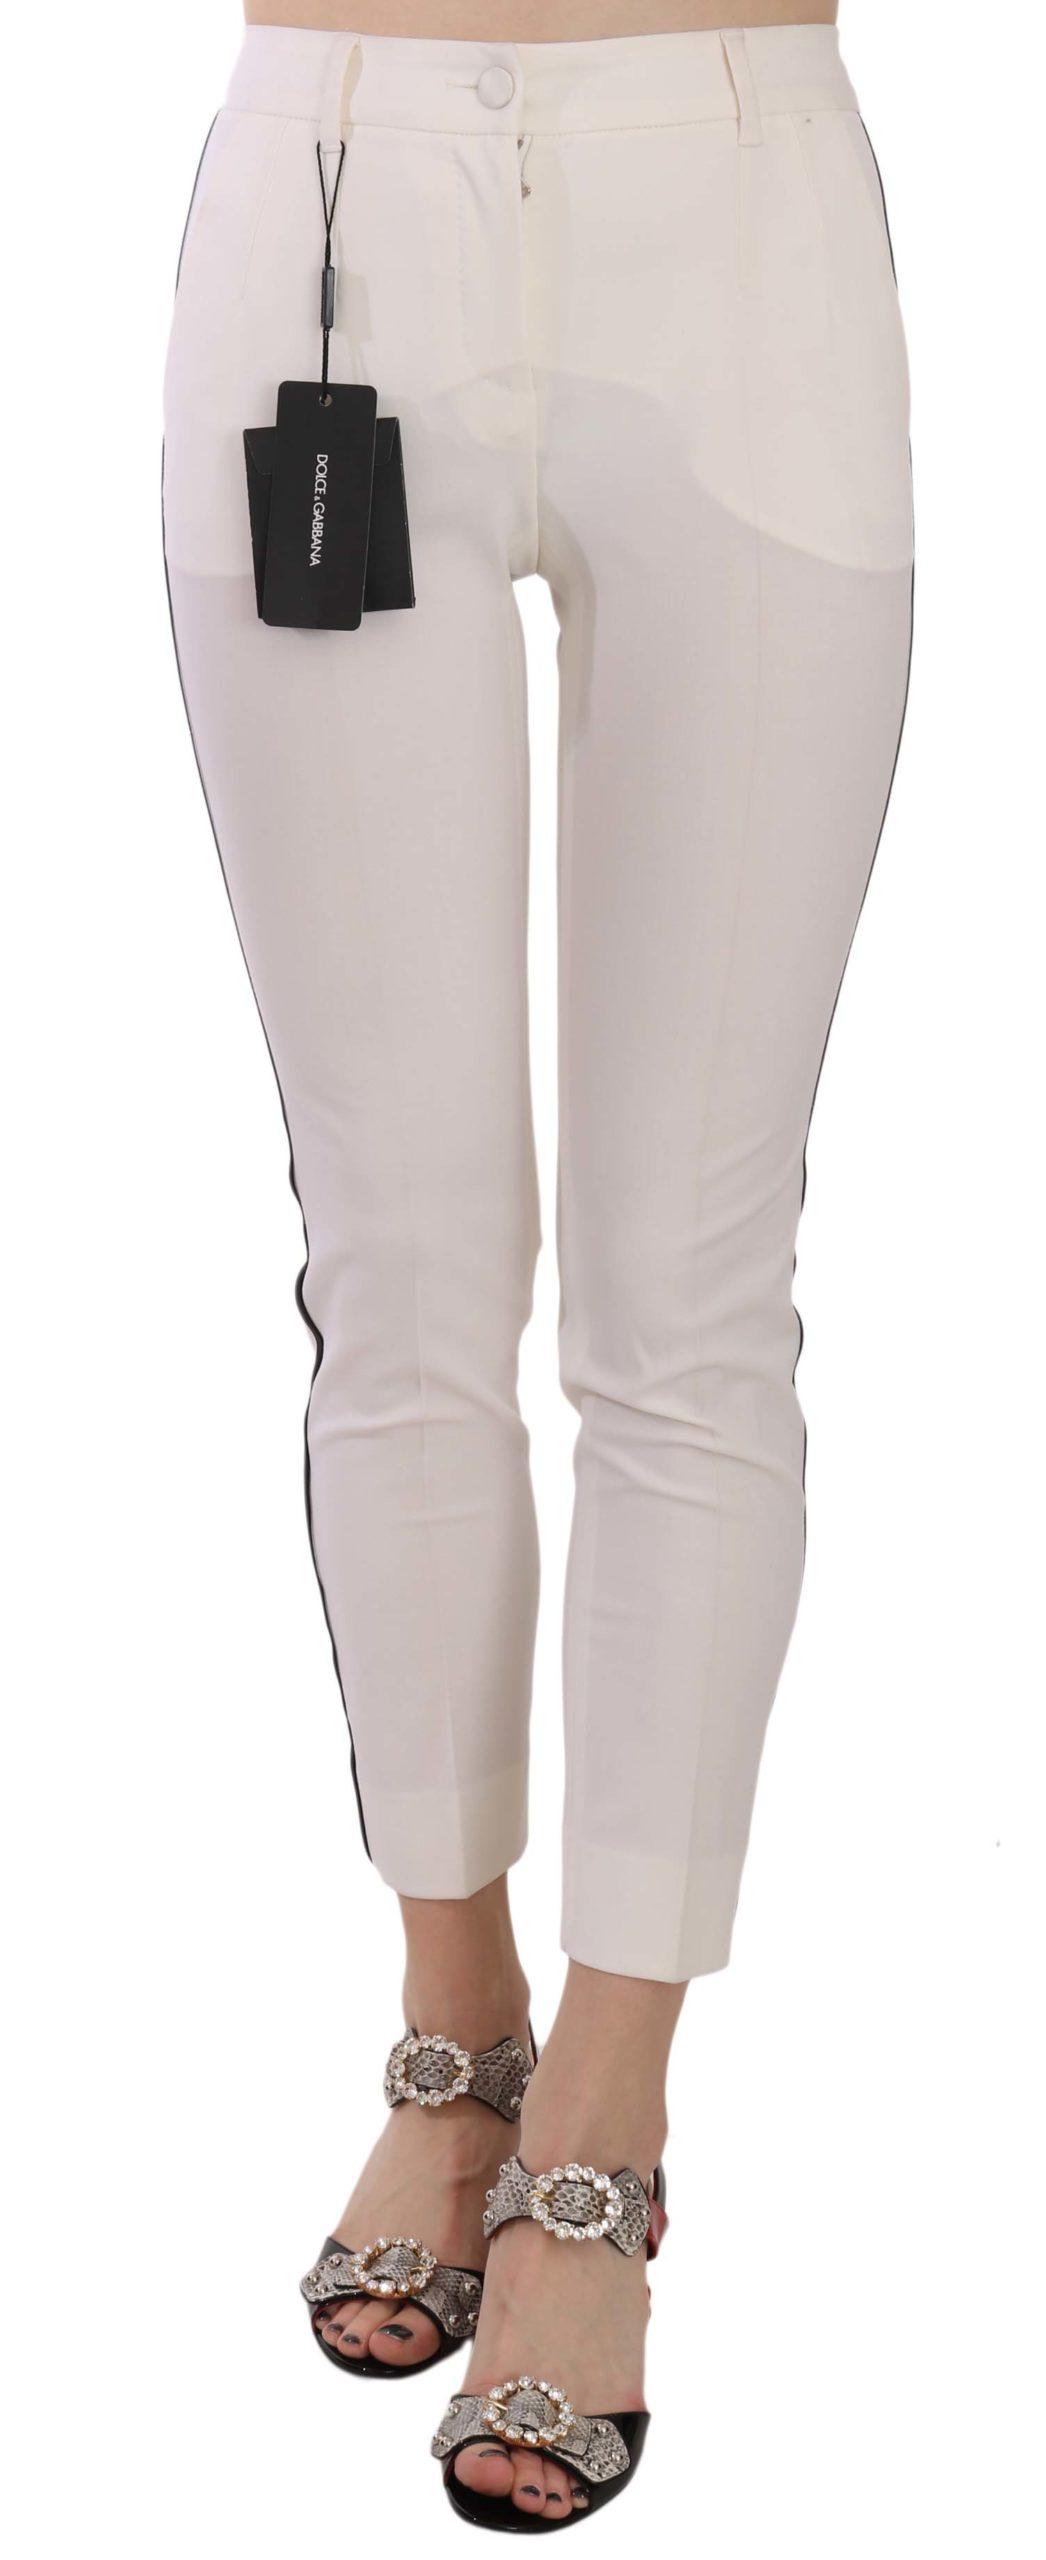 Dolce & Gabbana Women's Side Stripe Cropped Skinny Trouser White PAN70047 - IT36|XXS